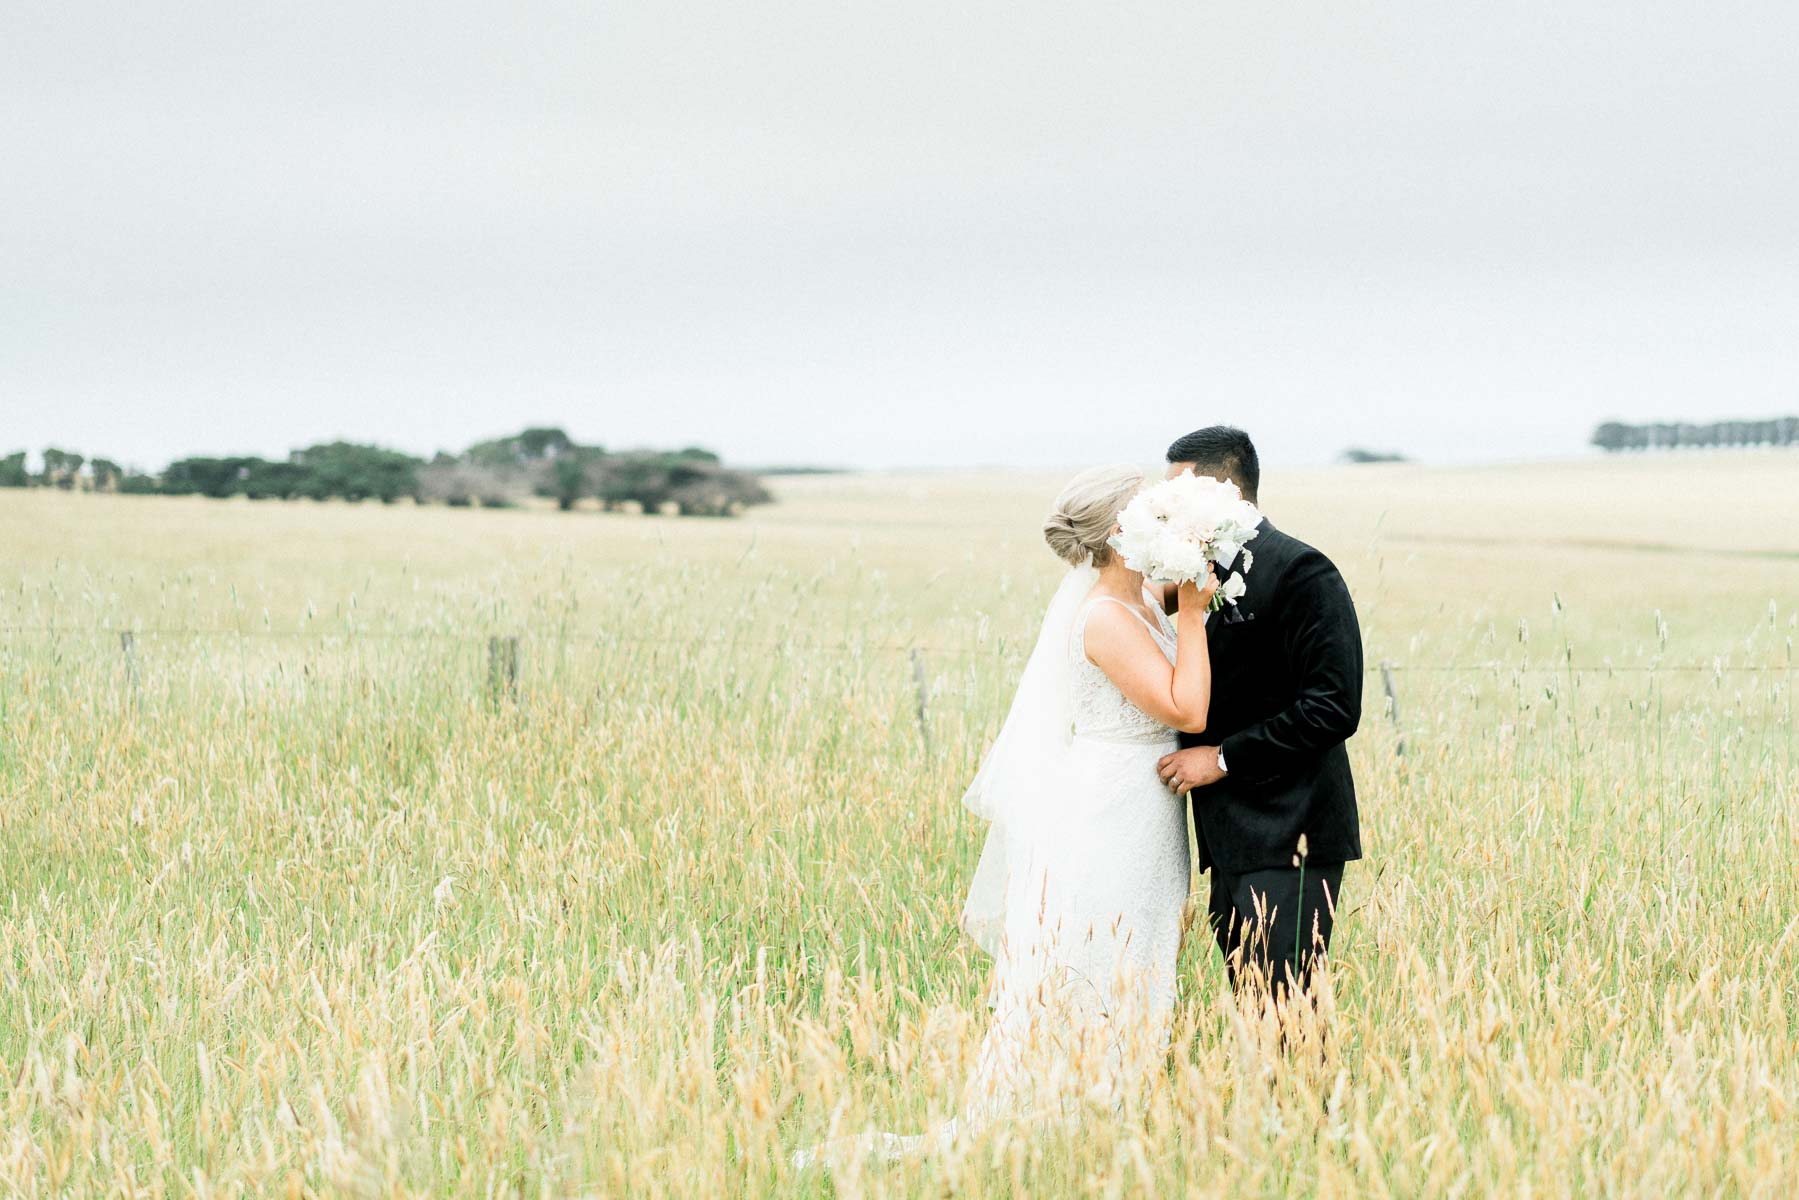 trenavin-chapel-phillip-island-wedding-heart+soul-weddings-sally-sean-01596.jpg